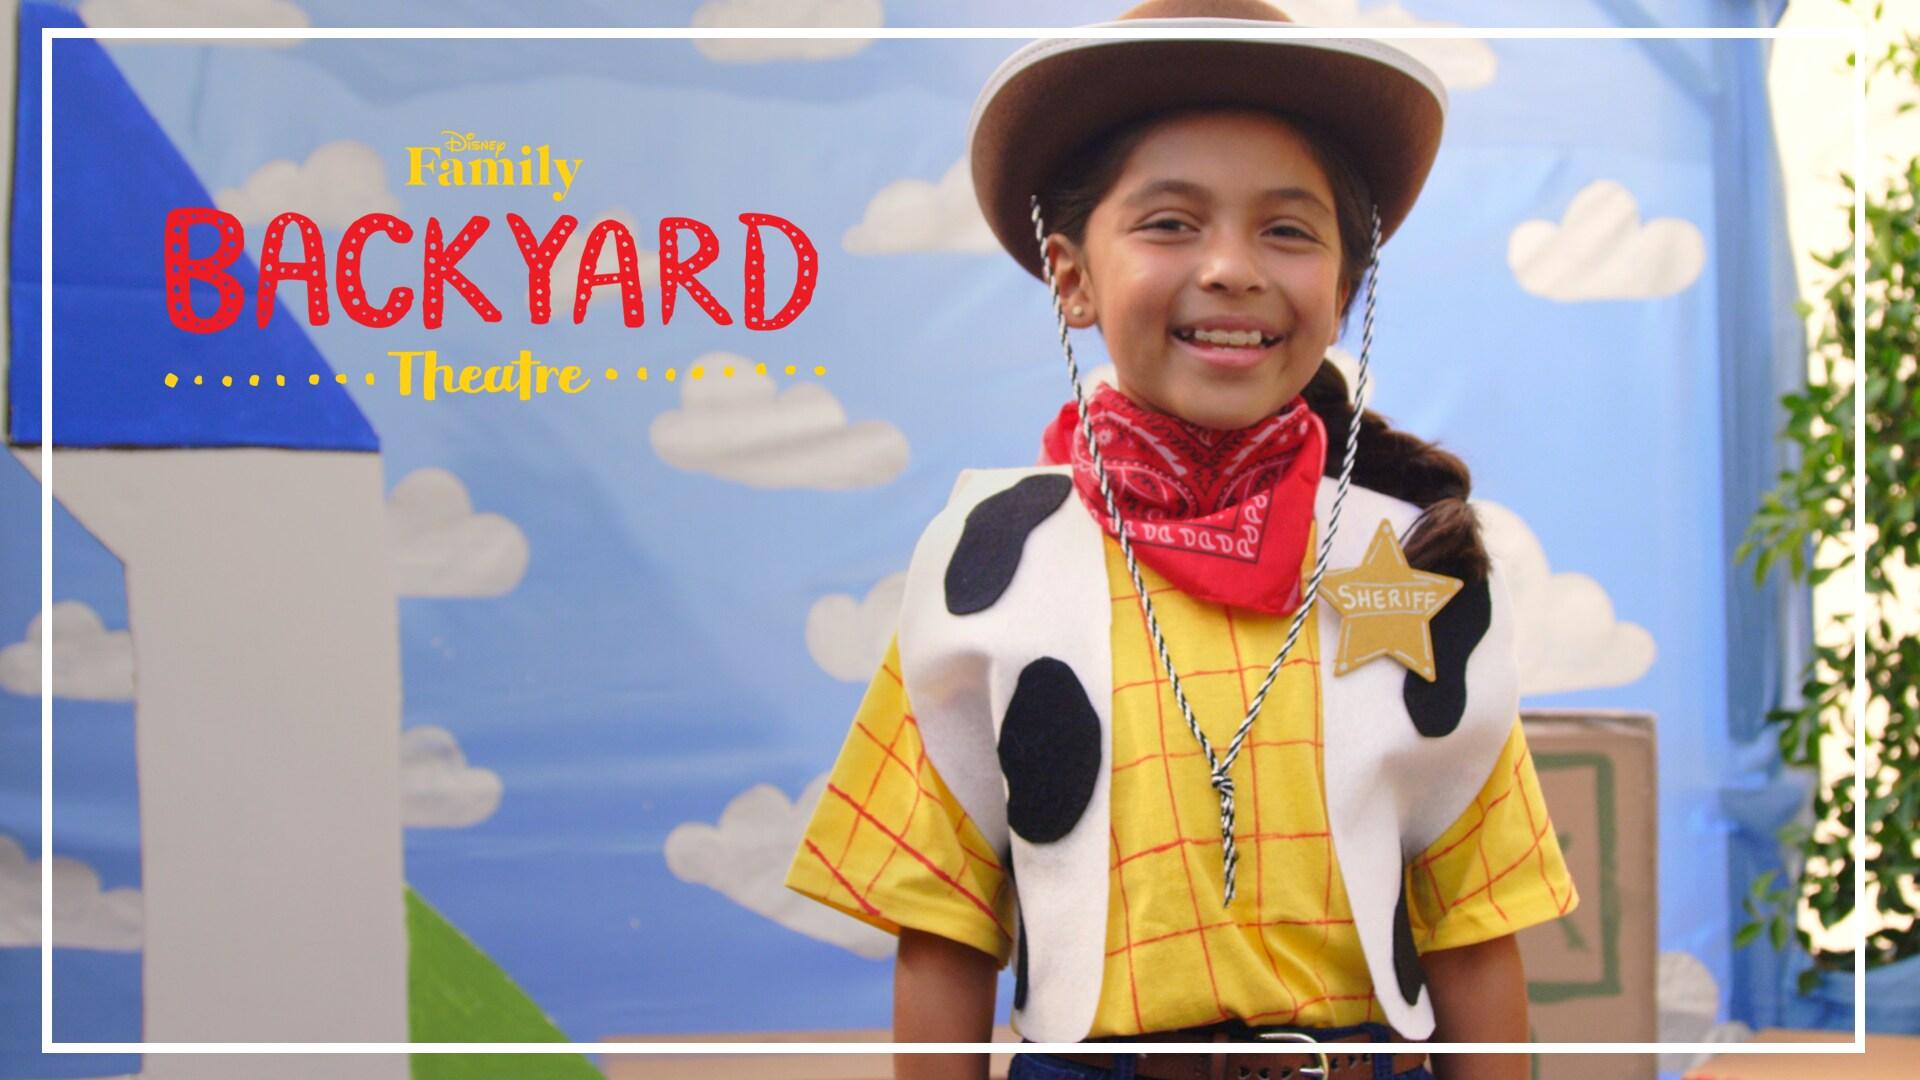 Backyard Theatre: Woody Costume DIY | Disney Family